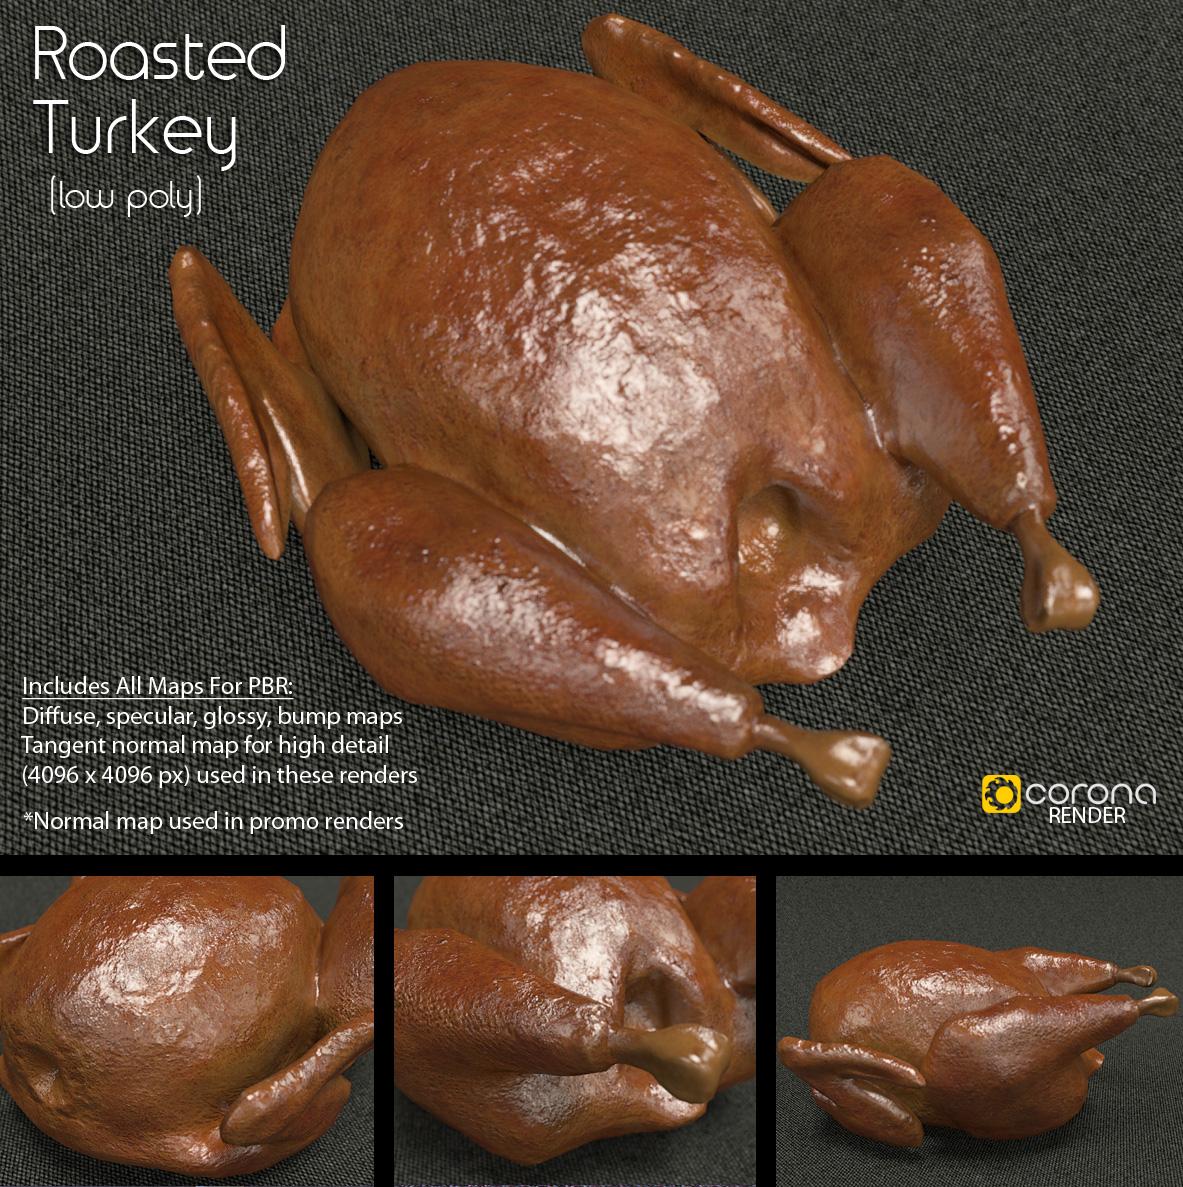 Free 3D Model: Roasted Turkey